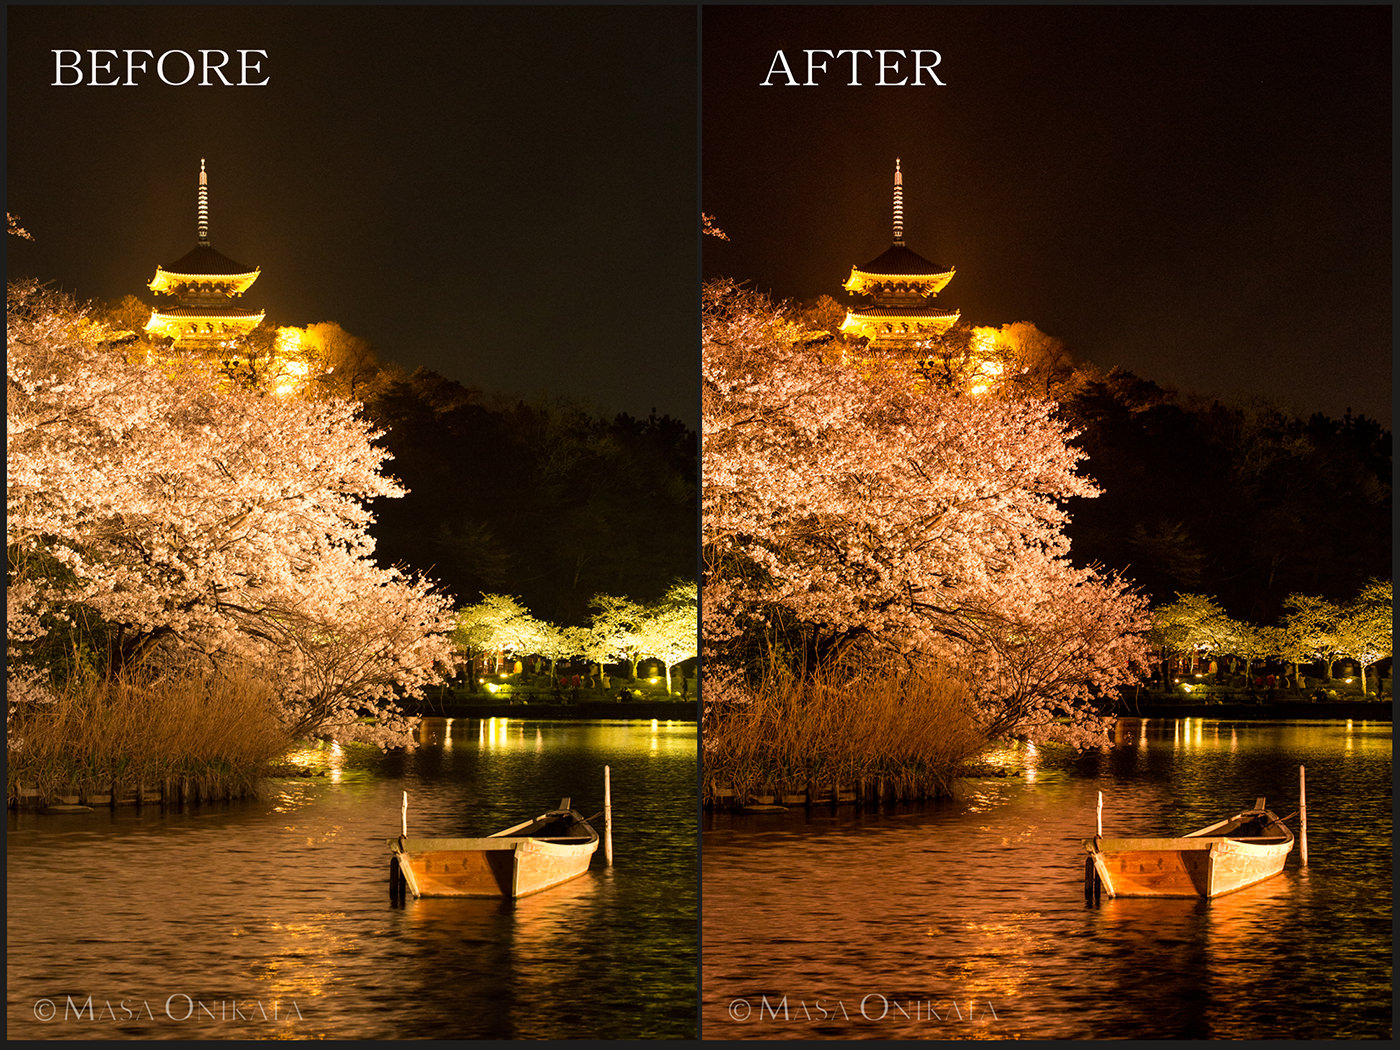 sankeien-before-after